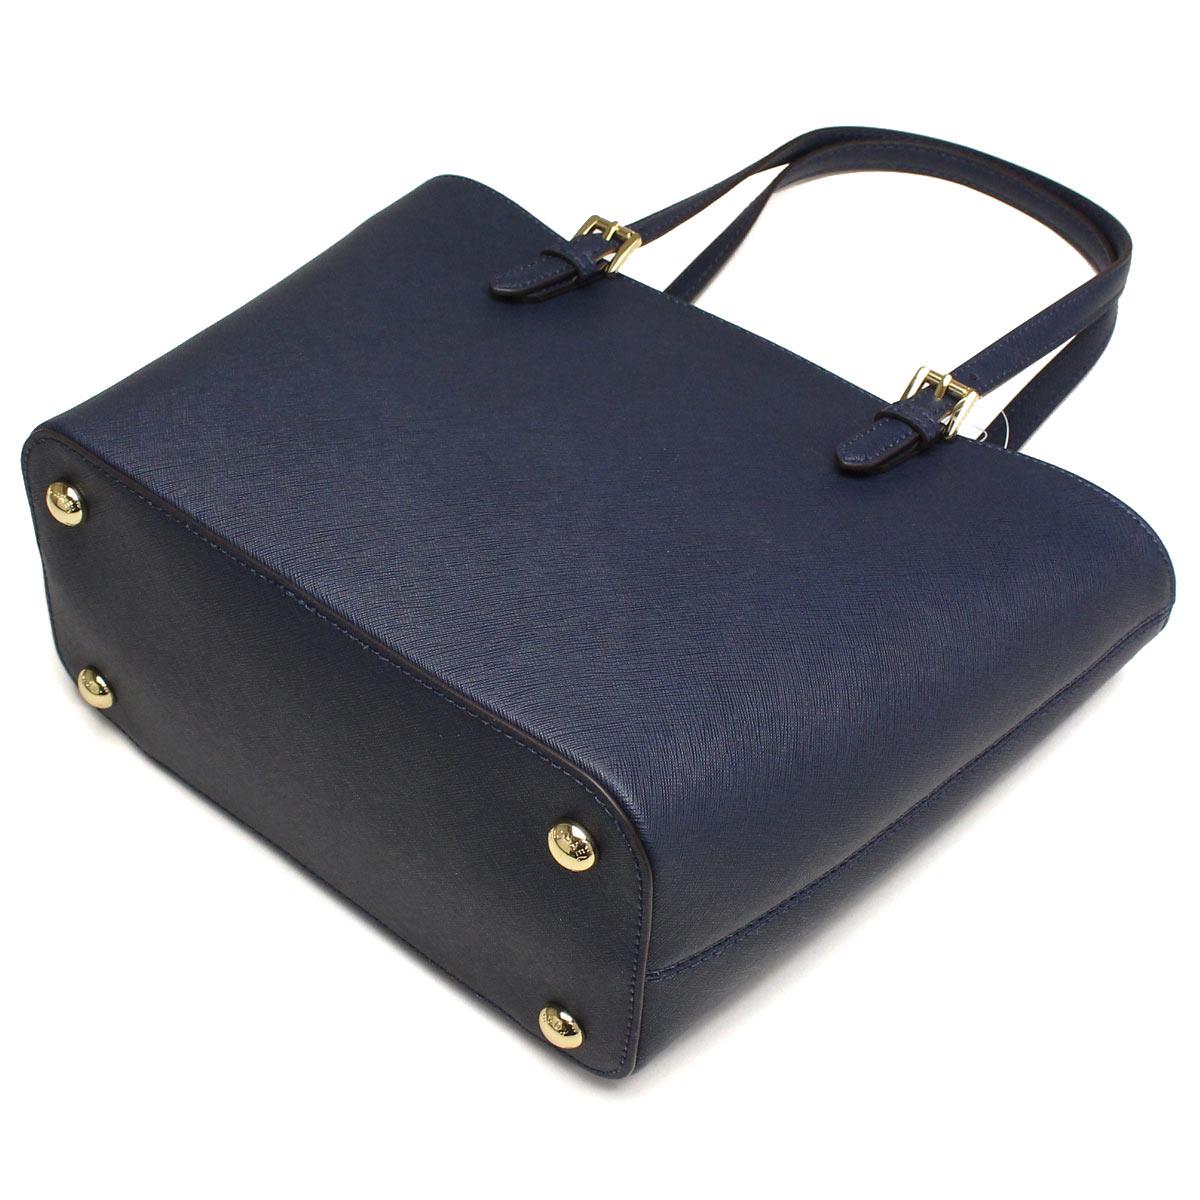 Michael Kors (MICHAEL KORS) JET SET ITEM tote bag 30H4GTTT2L NAVY Navy( taxfree/send by EMS/authentic/A brand new item )